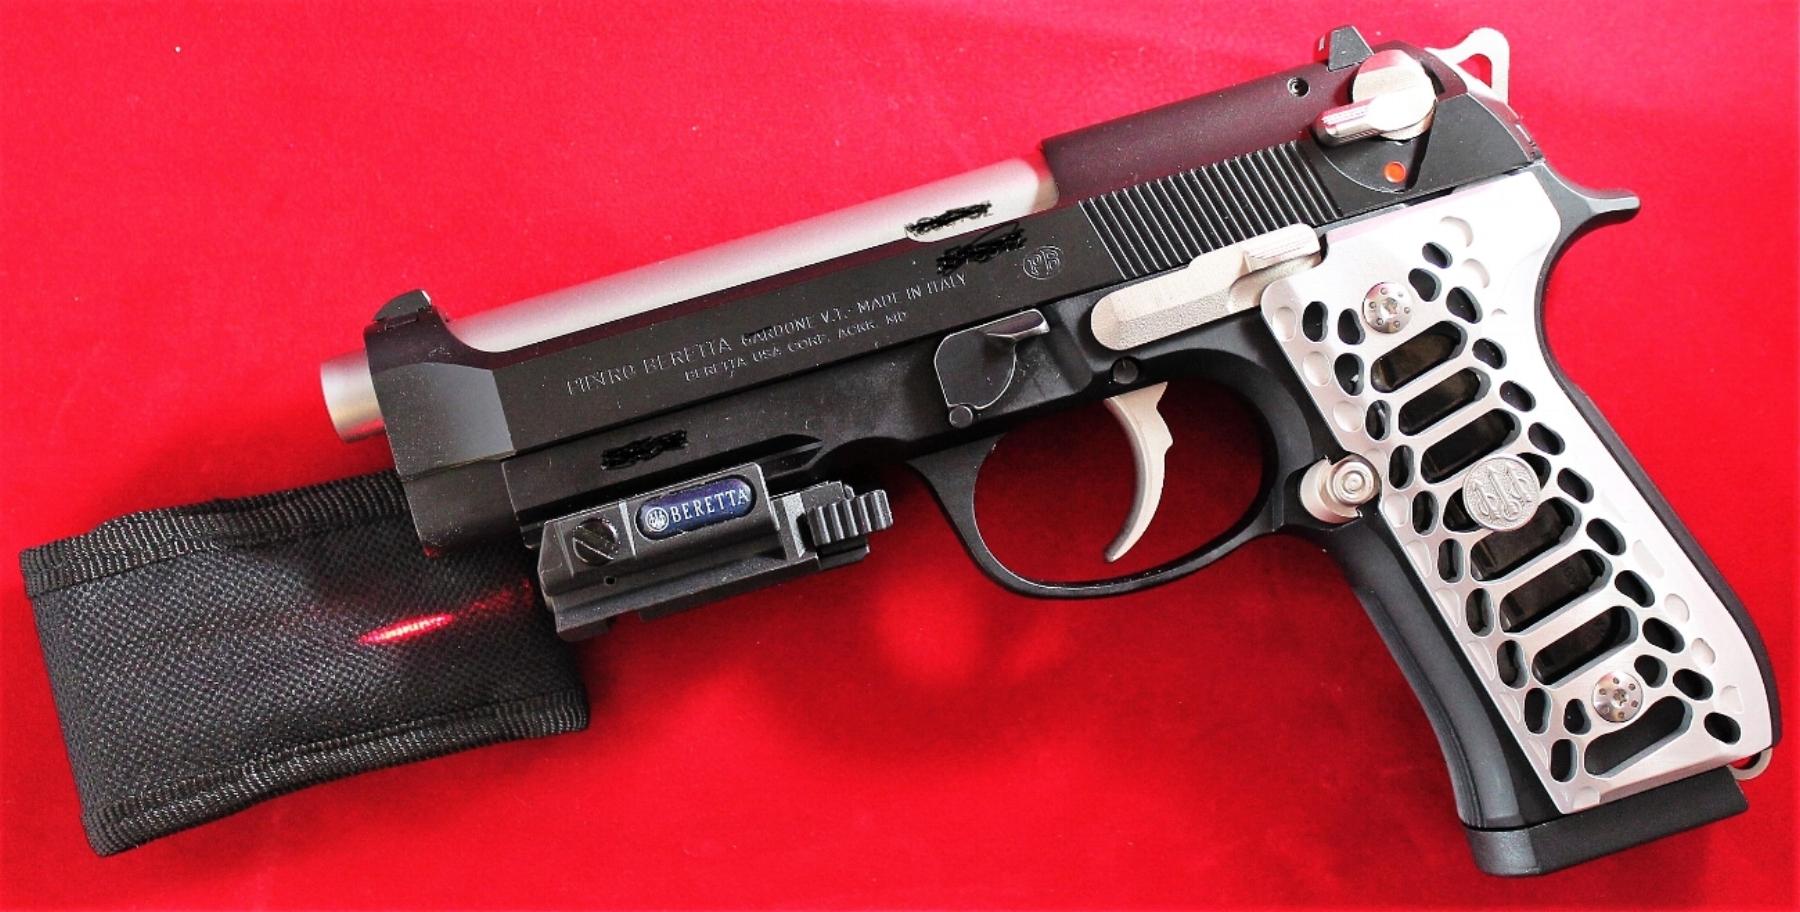 Beretta 92A1 9mm - Stainless performance parts, skeletonized hammer, Valkyrie Cobra grips, Beretta laser and logo medallion back on.